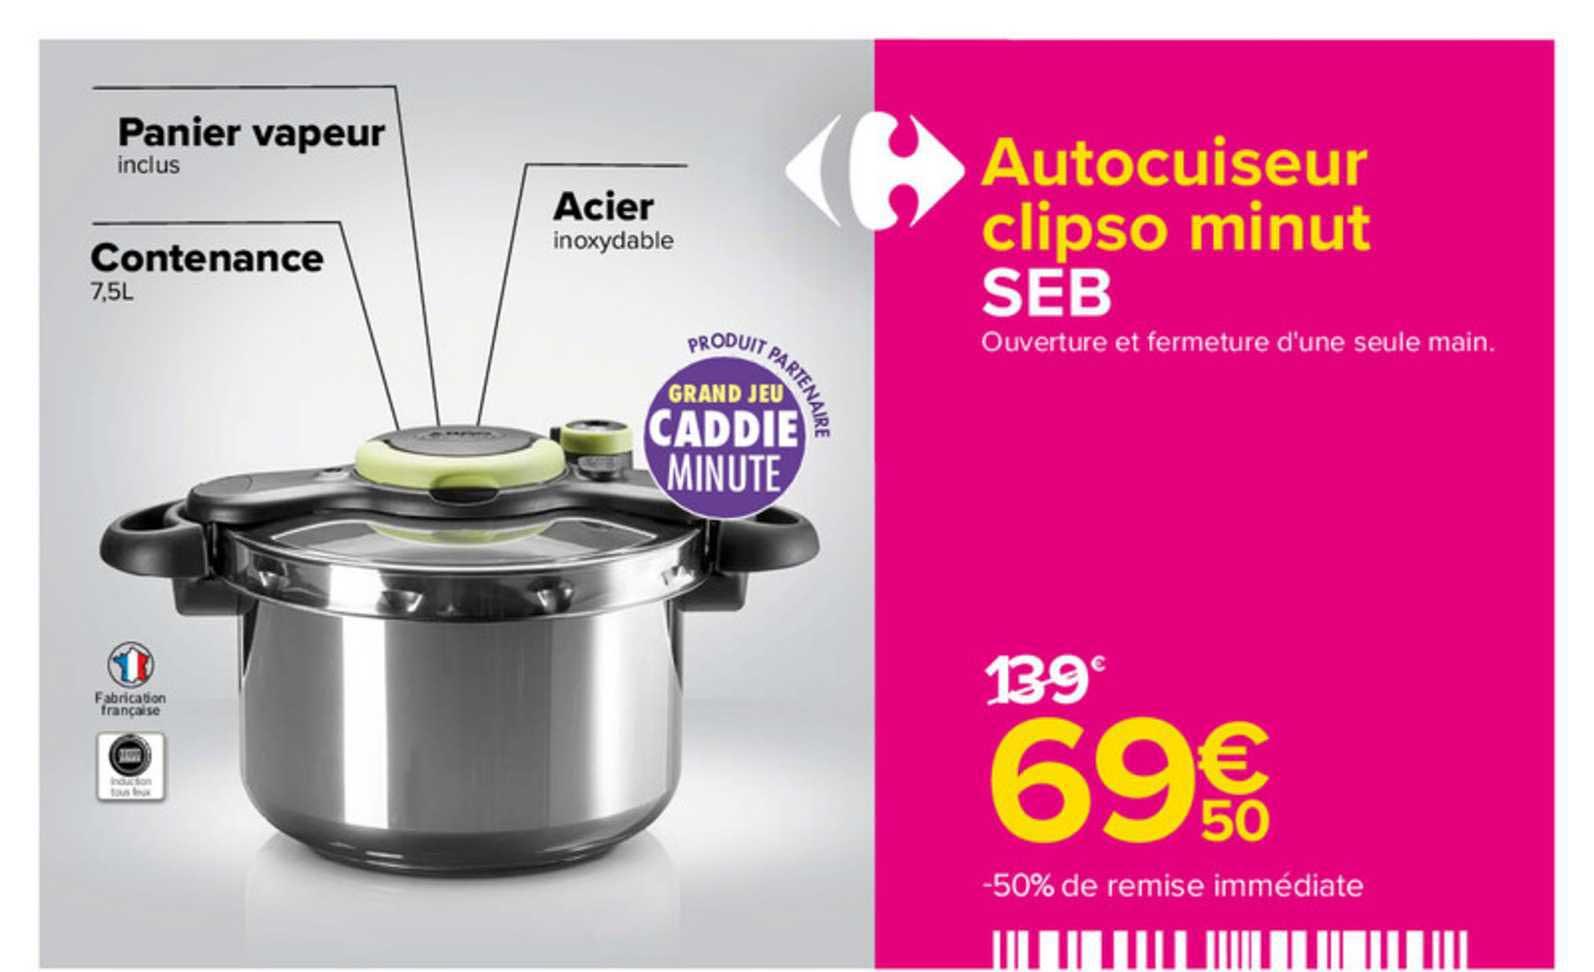 Carrefour Autocuiseur Clipso Minut Seb